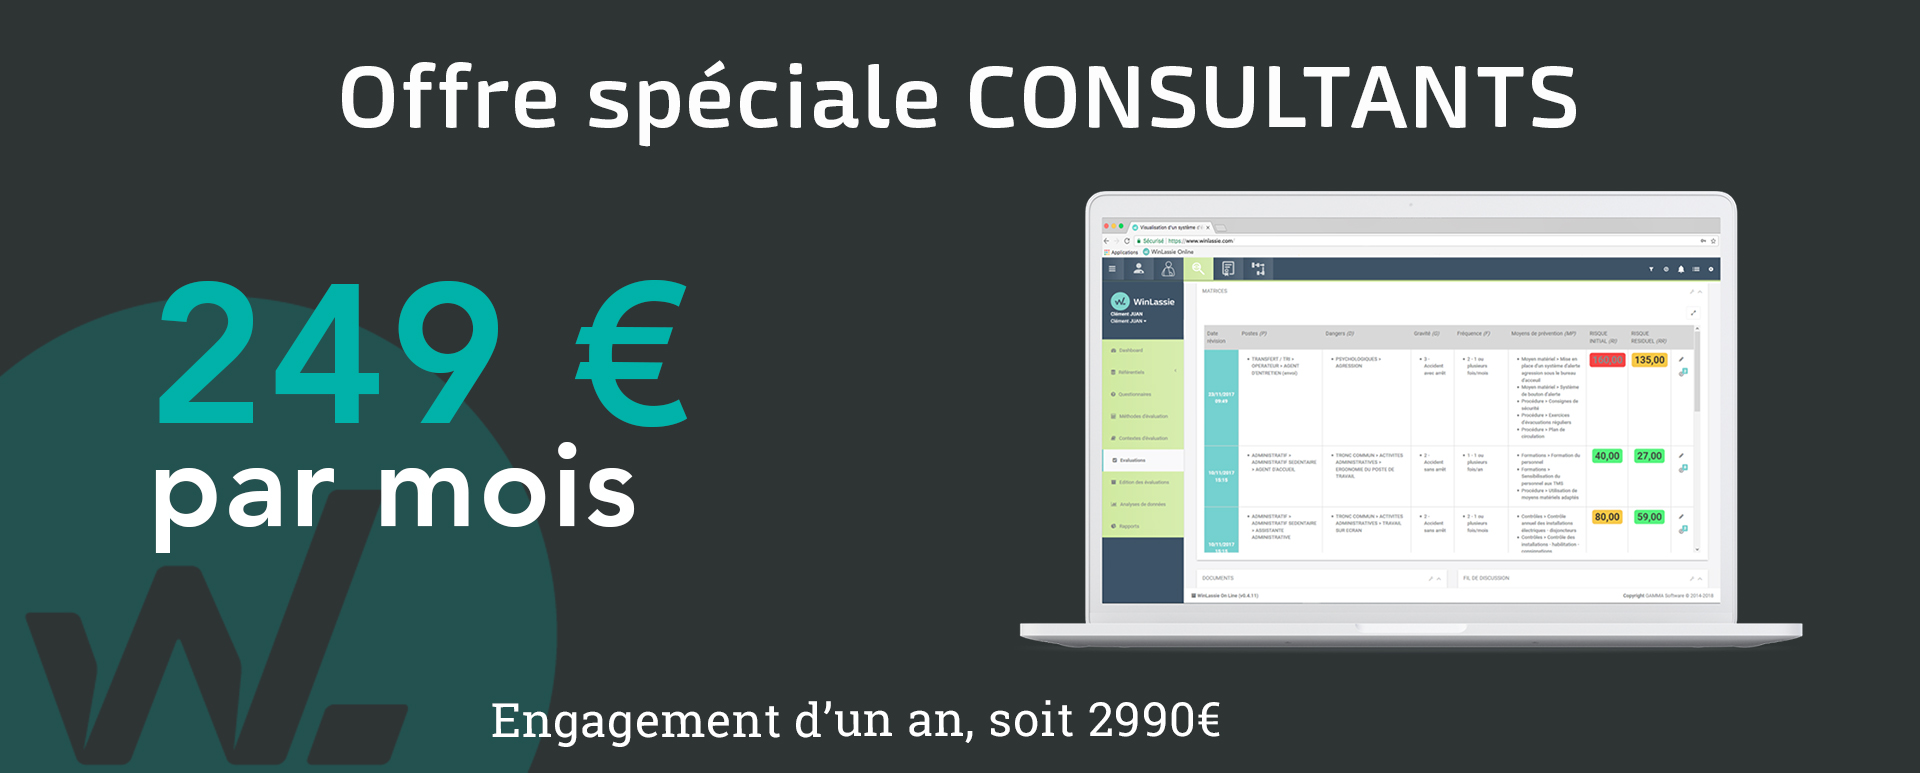 Atouts-offre-consultants-WinLassie-document unique.